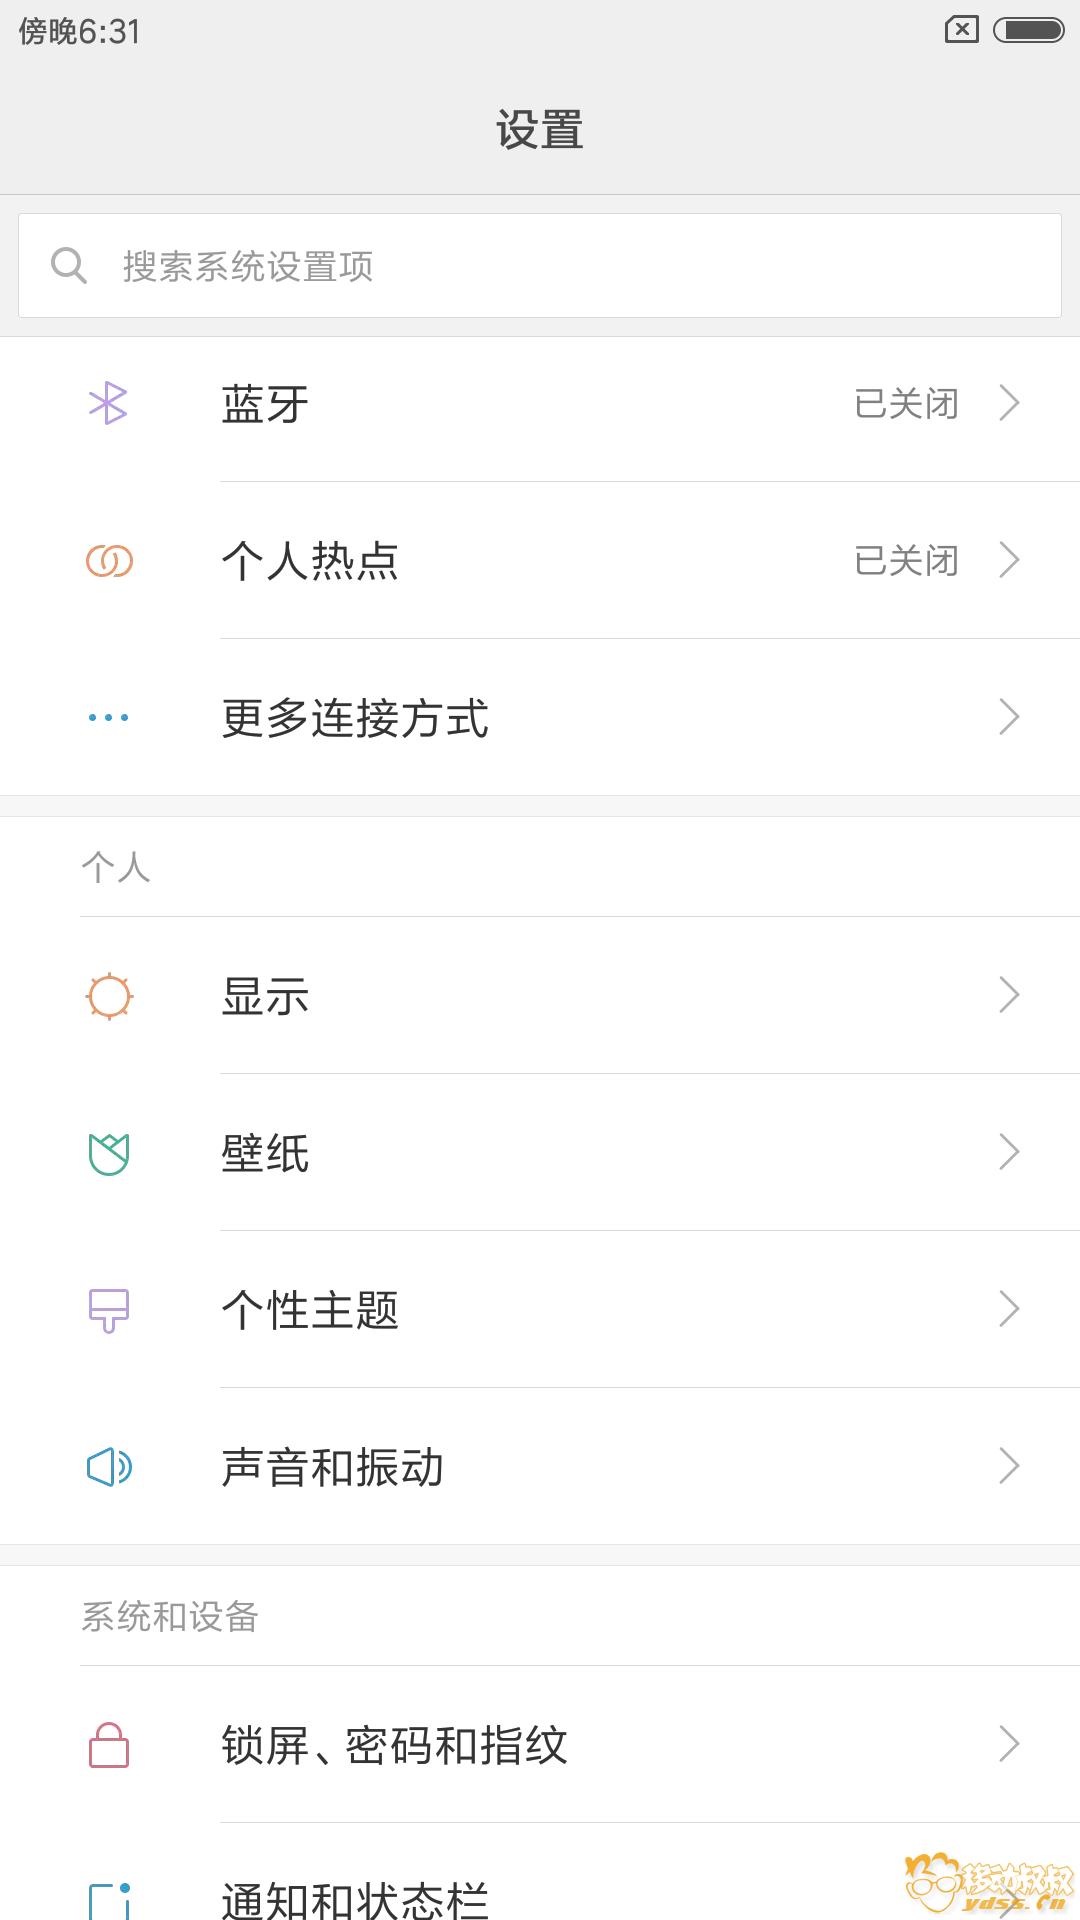 Screenshot_2018-03-26-18-31-32-771_com.android.settings.png